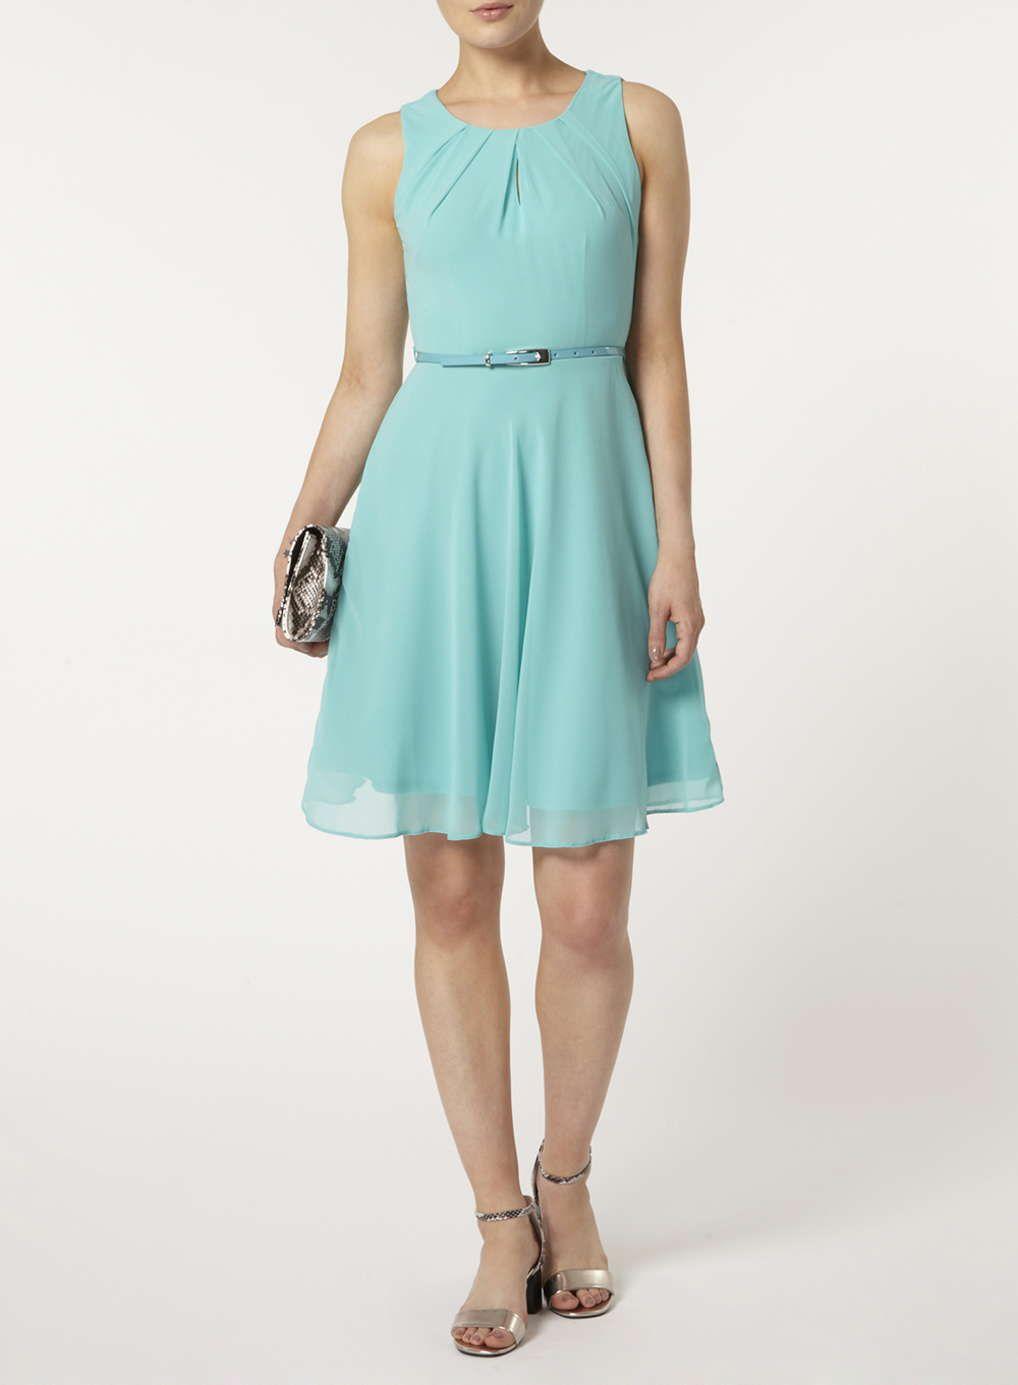 Billie & Blossom Green Chiffon Dress | Alison\'s Buoyant Spring ...